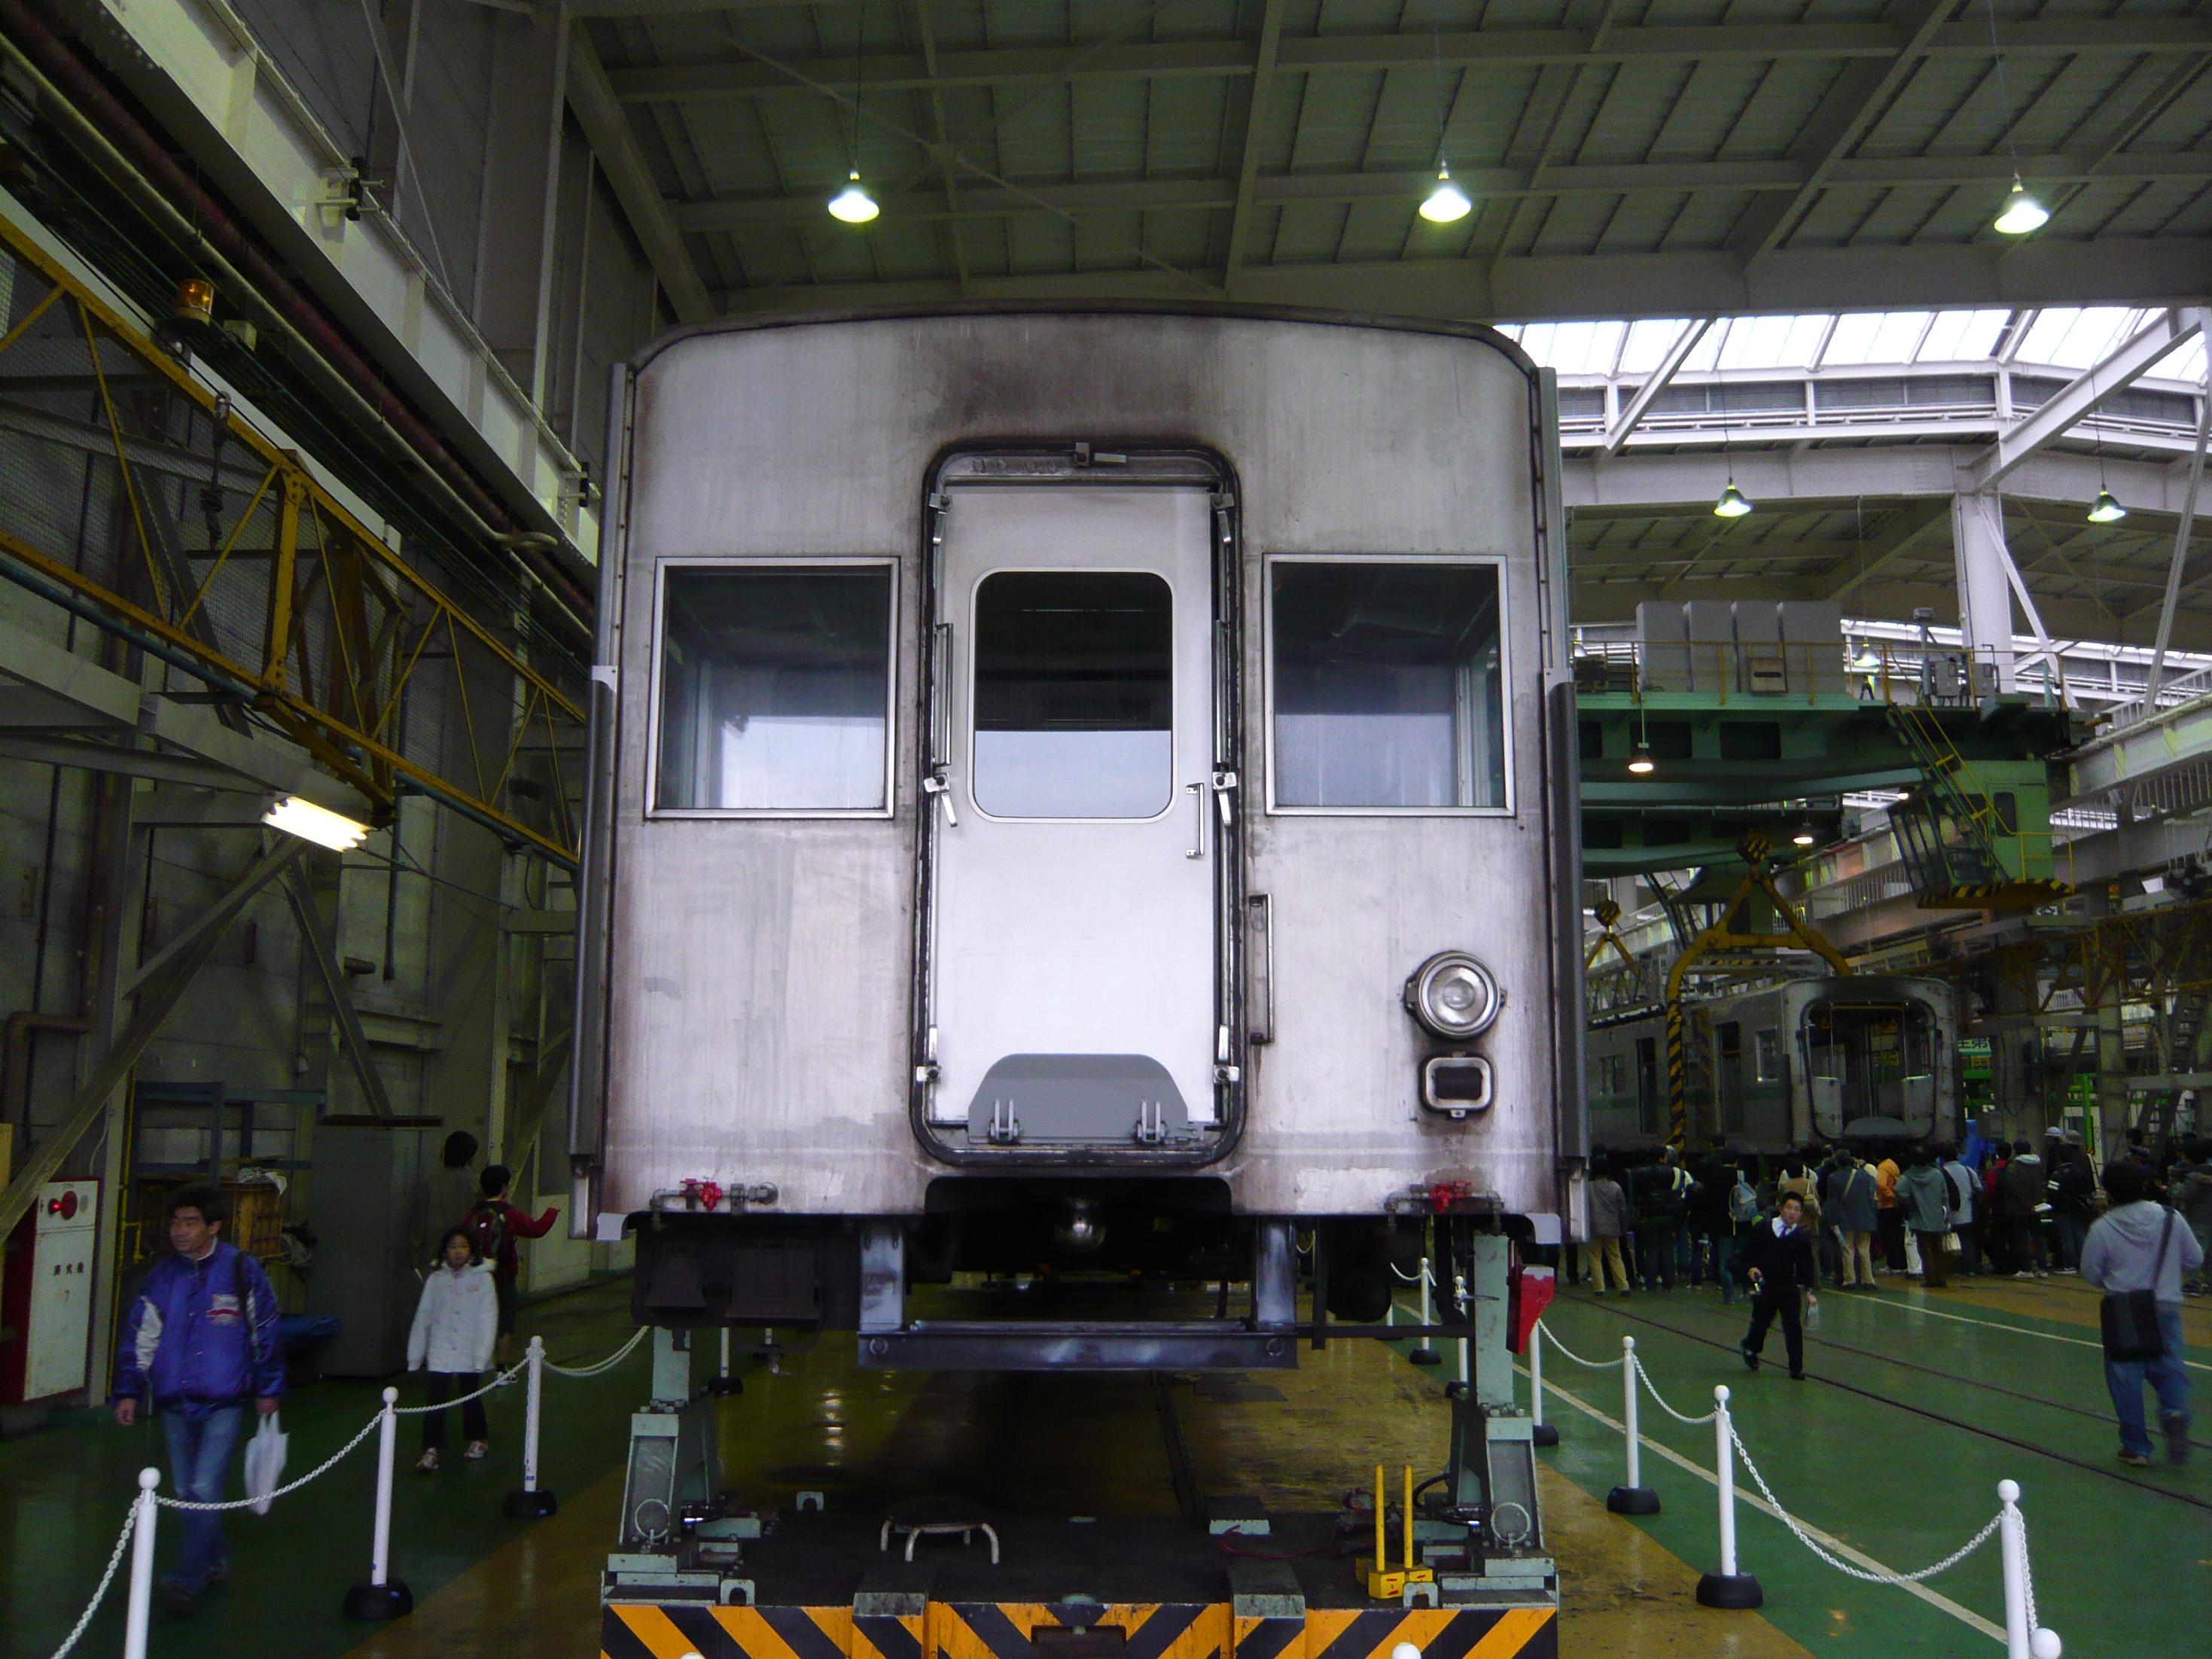 P1010780-2.JPG